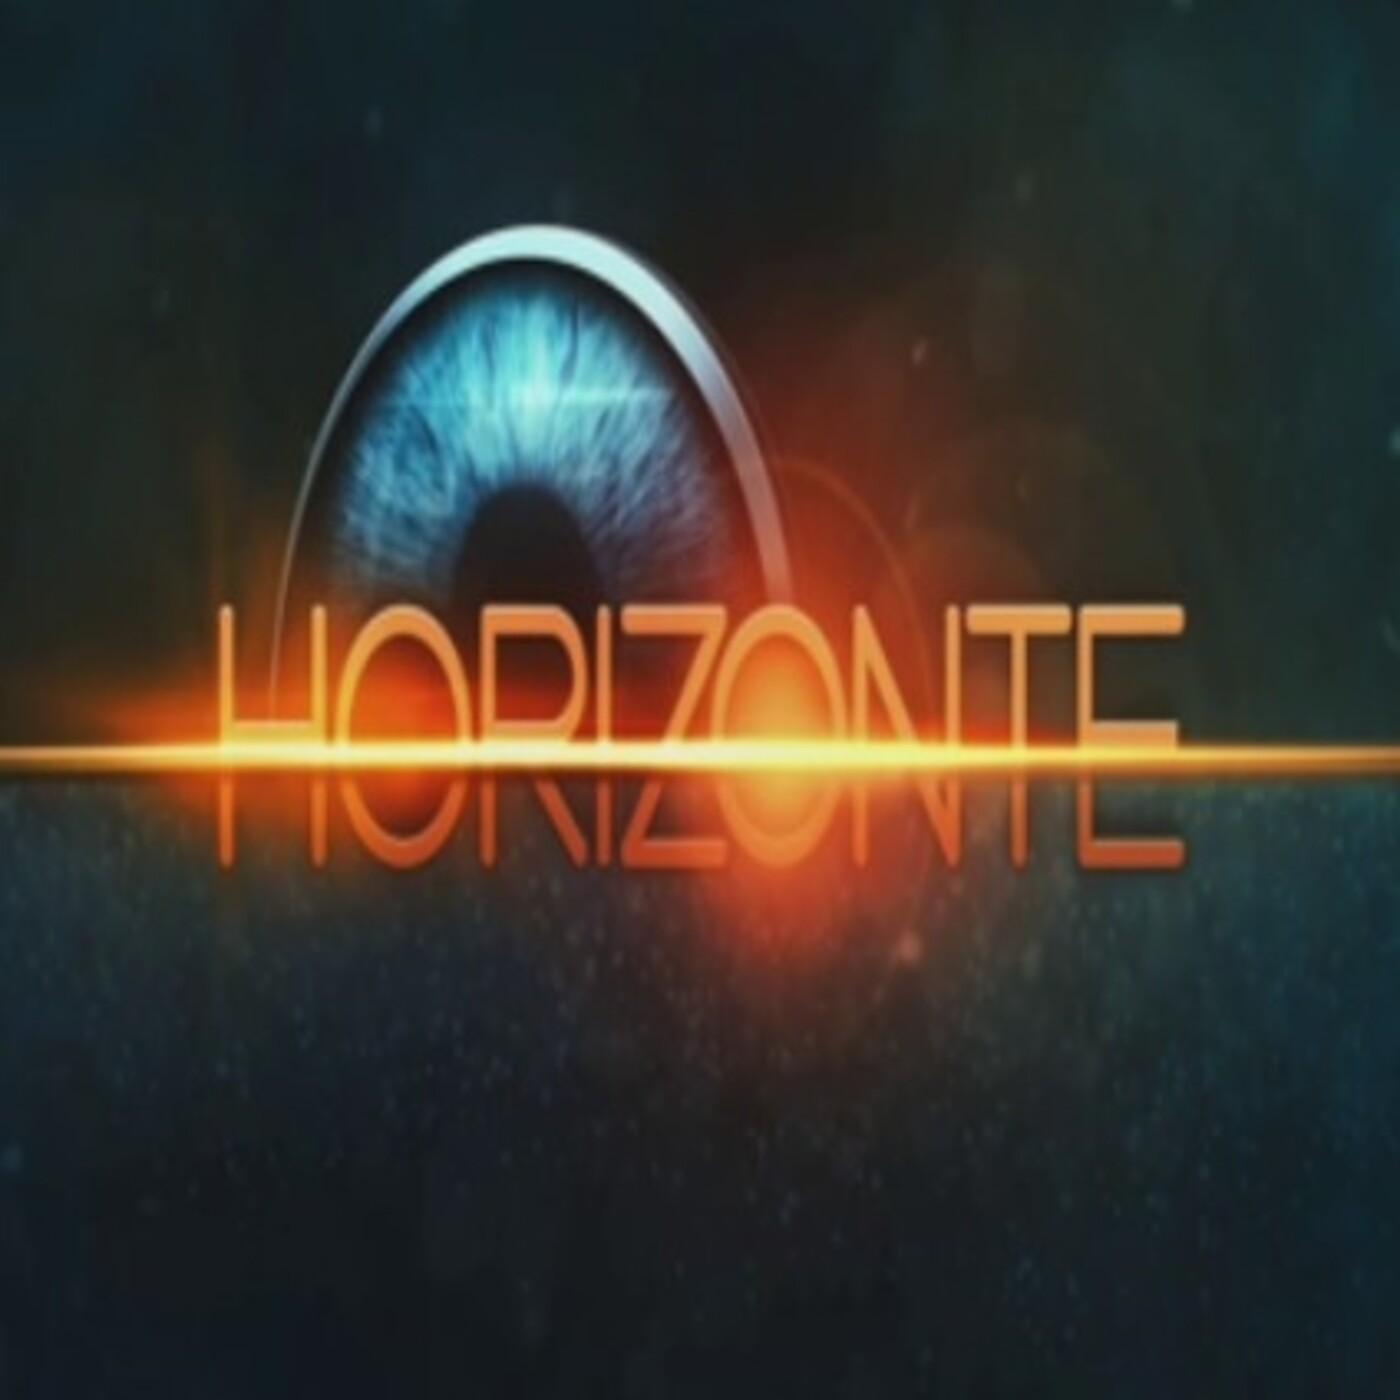 Horizonte T2x02 (16-09-2021): Alcasser: última hora